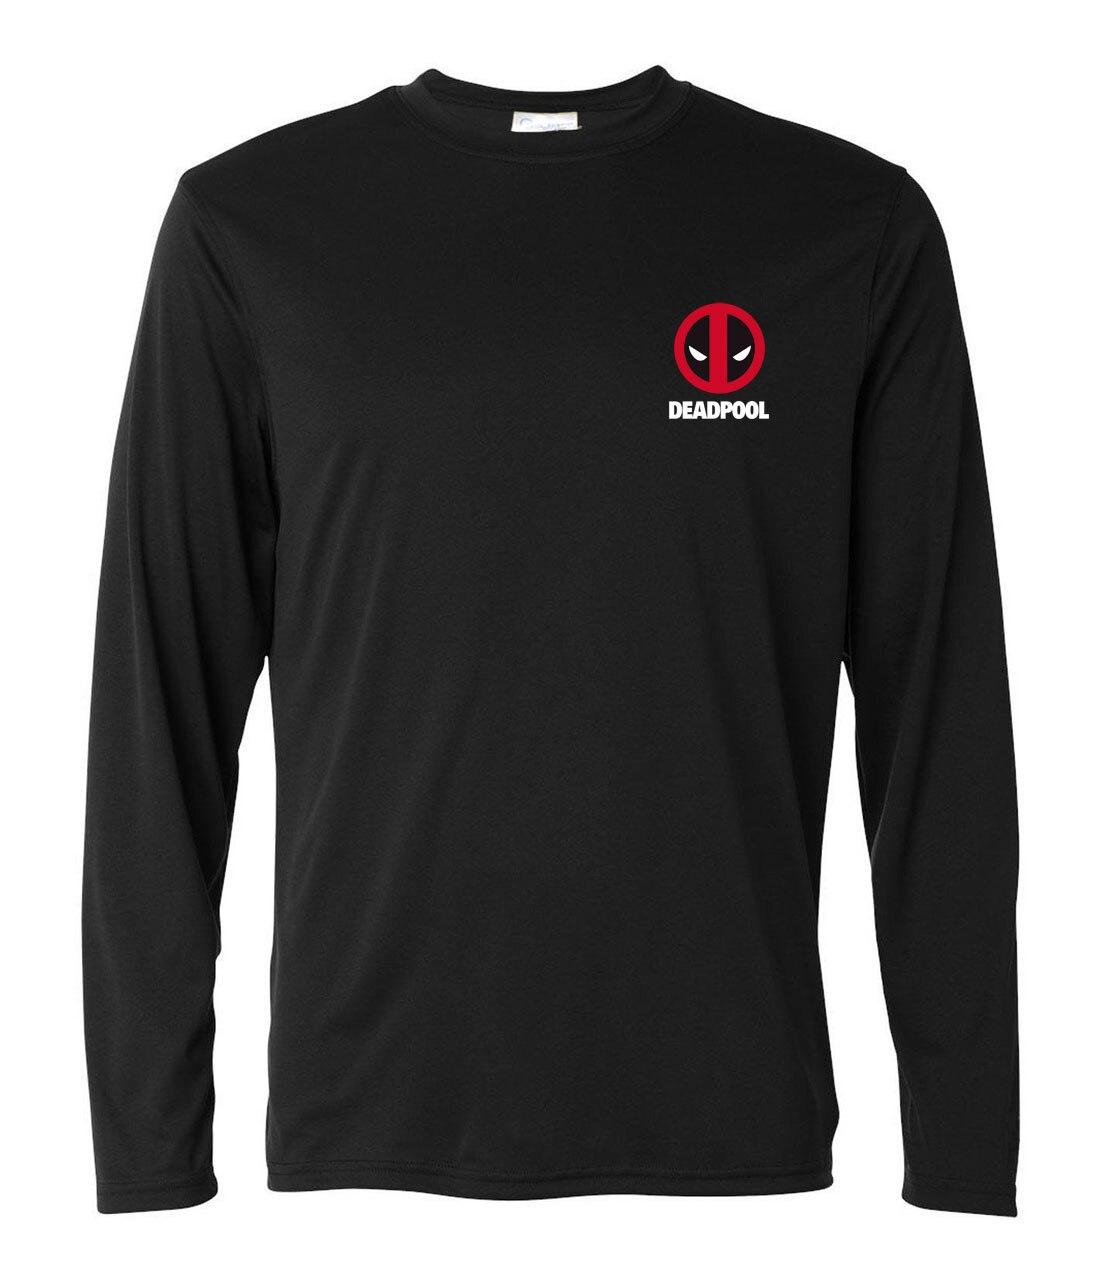 2019  long sleeve t shirts men spring summer cotton o-neck camisetas homme marvel deadpool printed fashion brand clothing